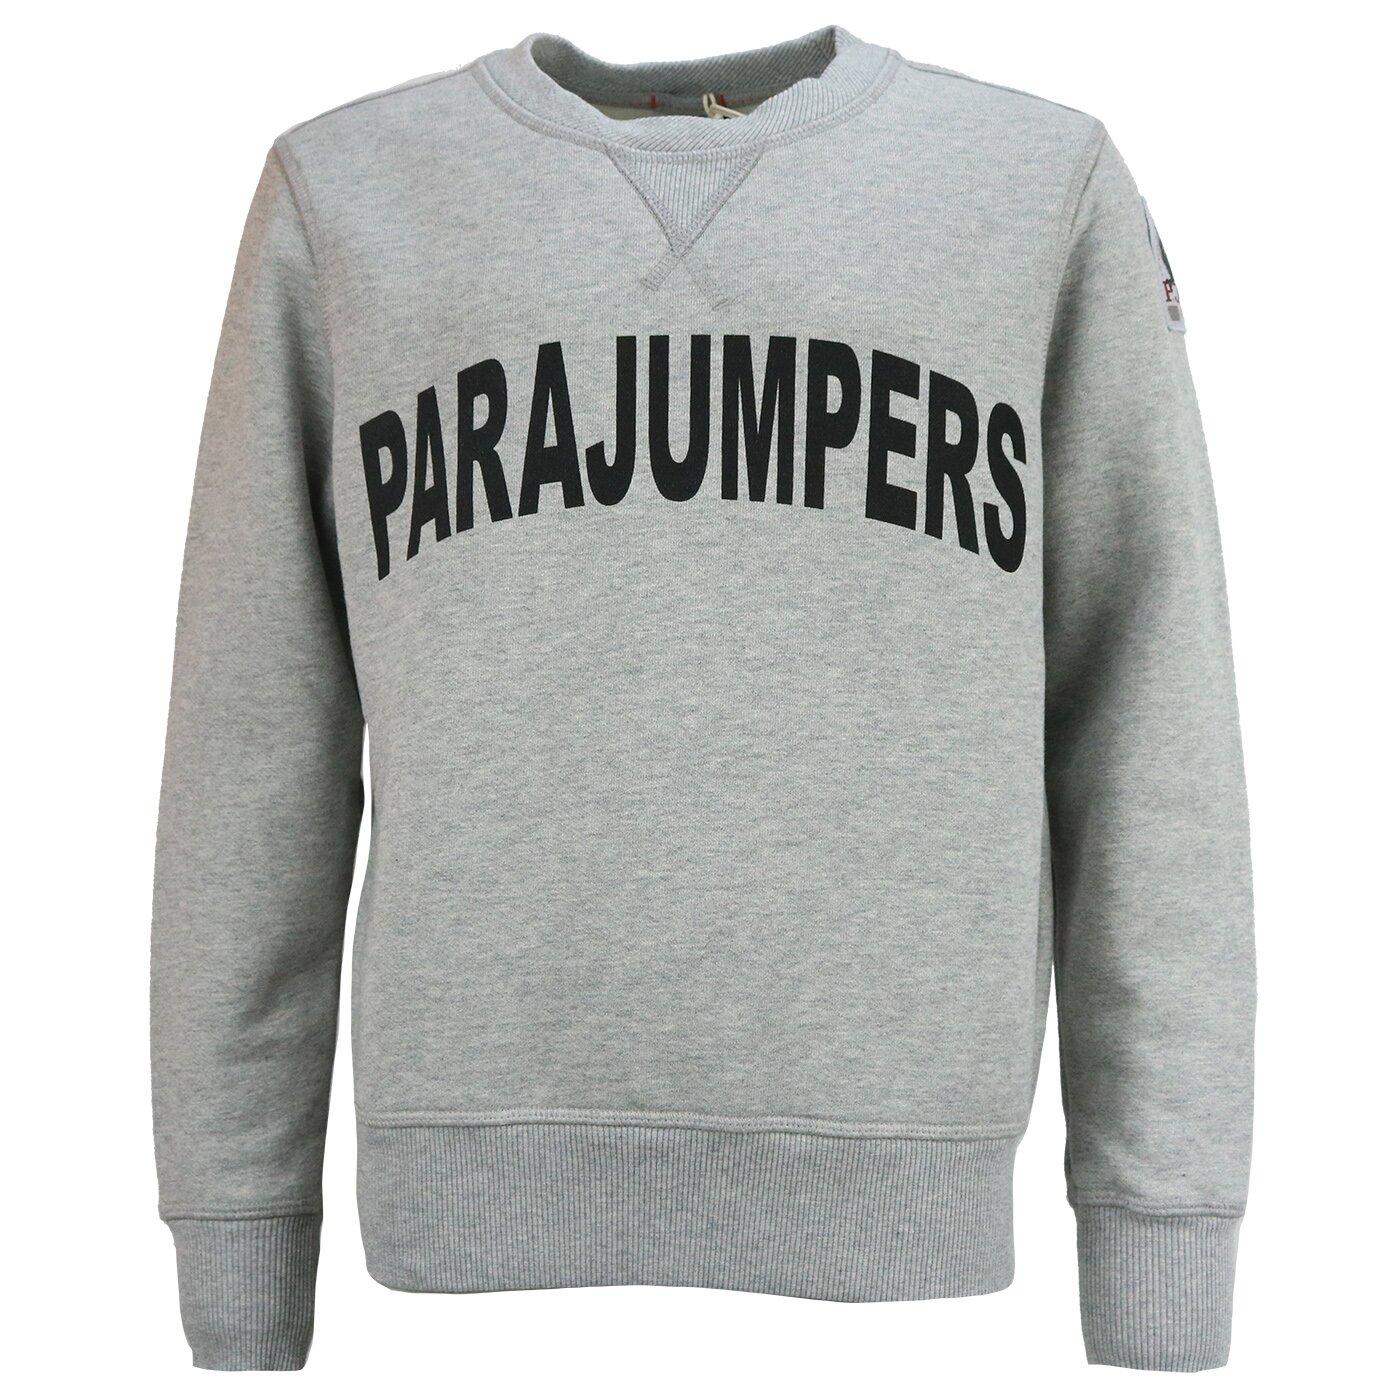 Parajumpers Caleb Sweater Grey CF61-566